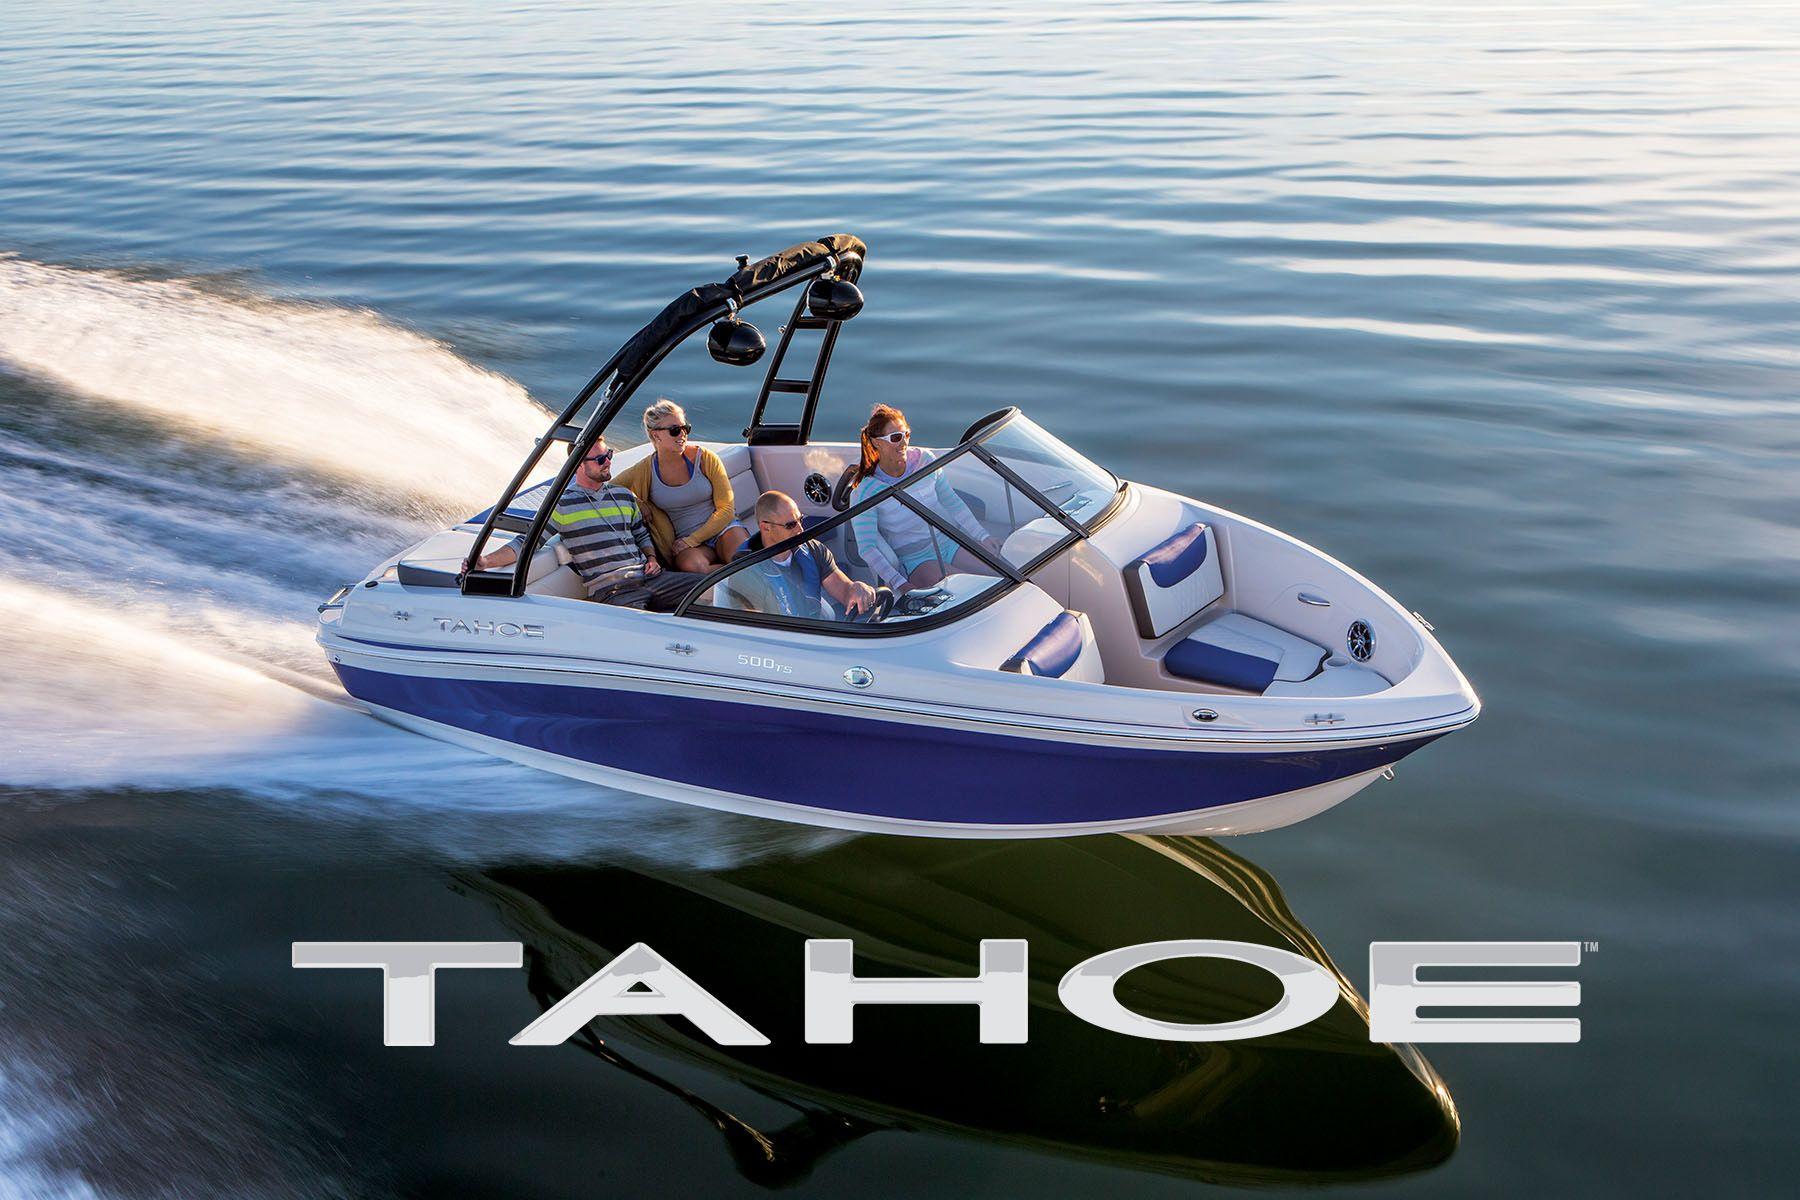 Brand new 2015 model sport boat tahoe 500 ts exclusive